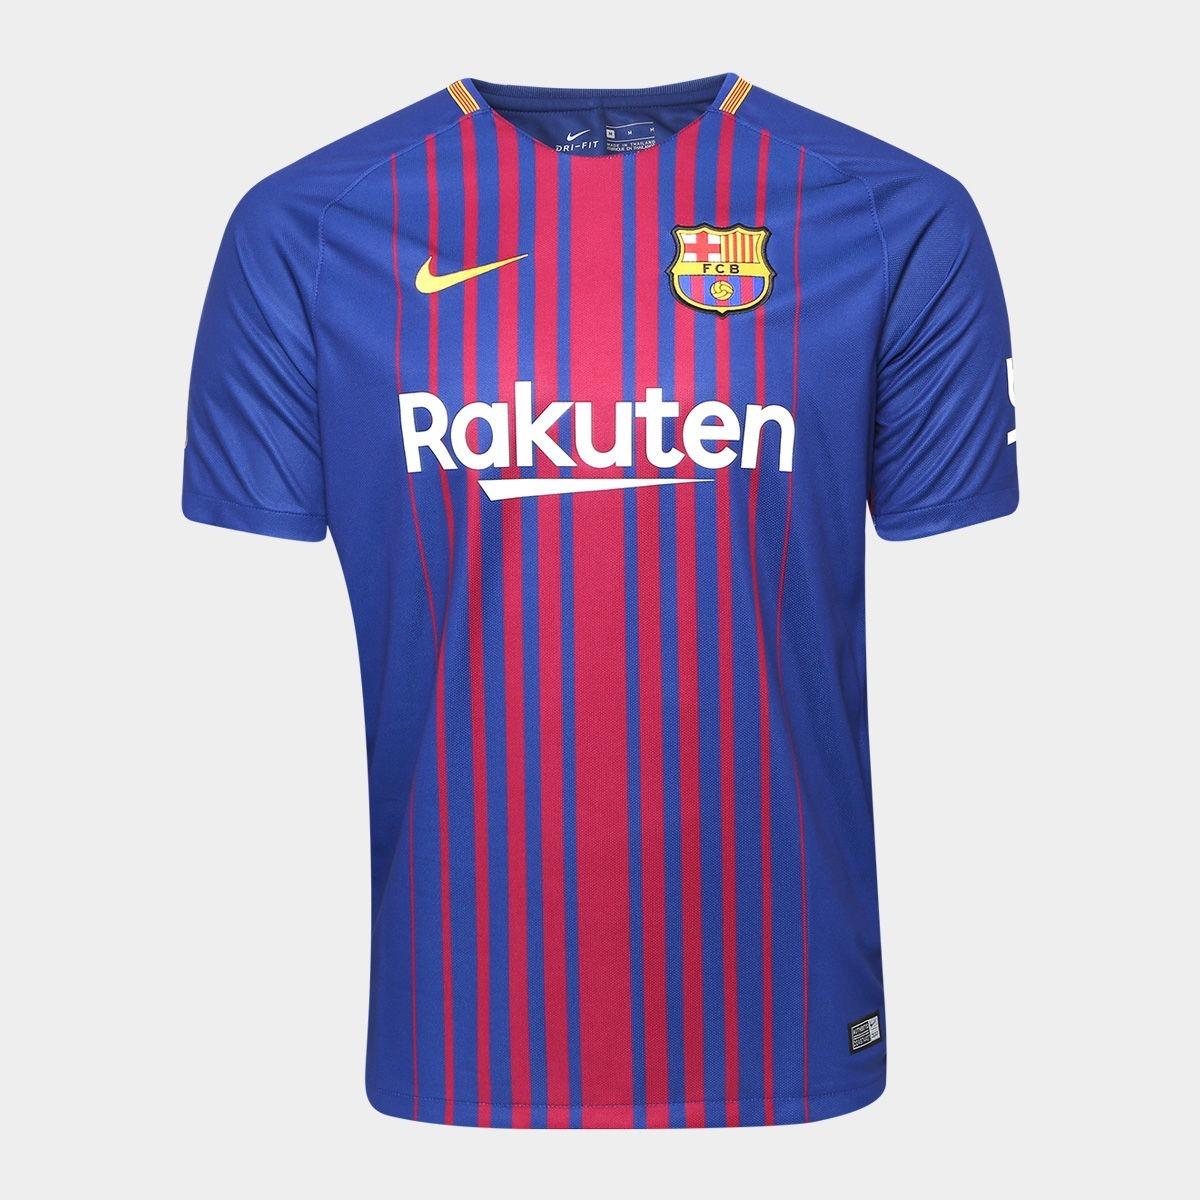 camisa nike barcelona 2018 messi 10 - foto real. Carregando zoom. f9c386ea25198